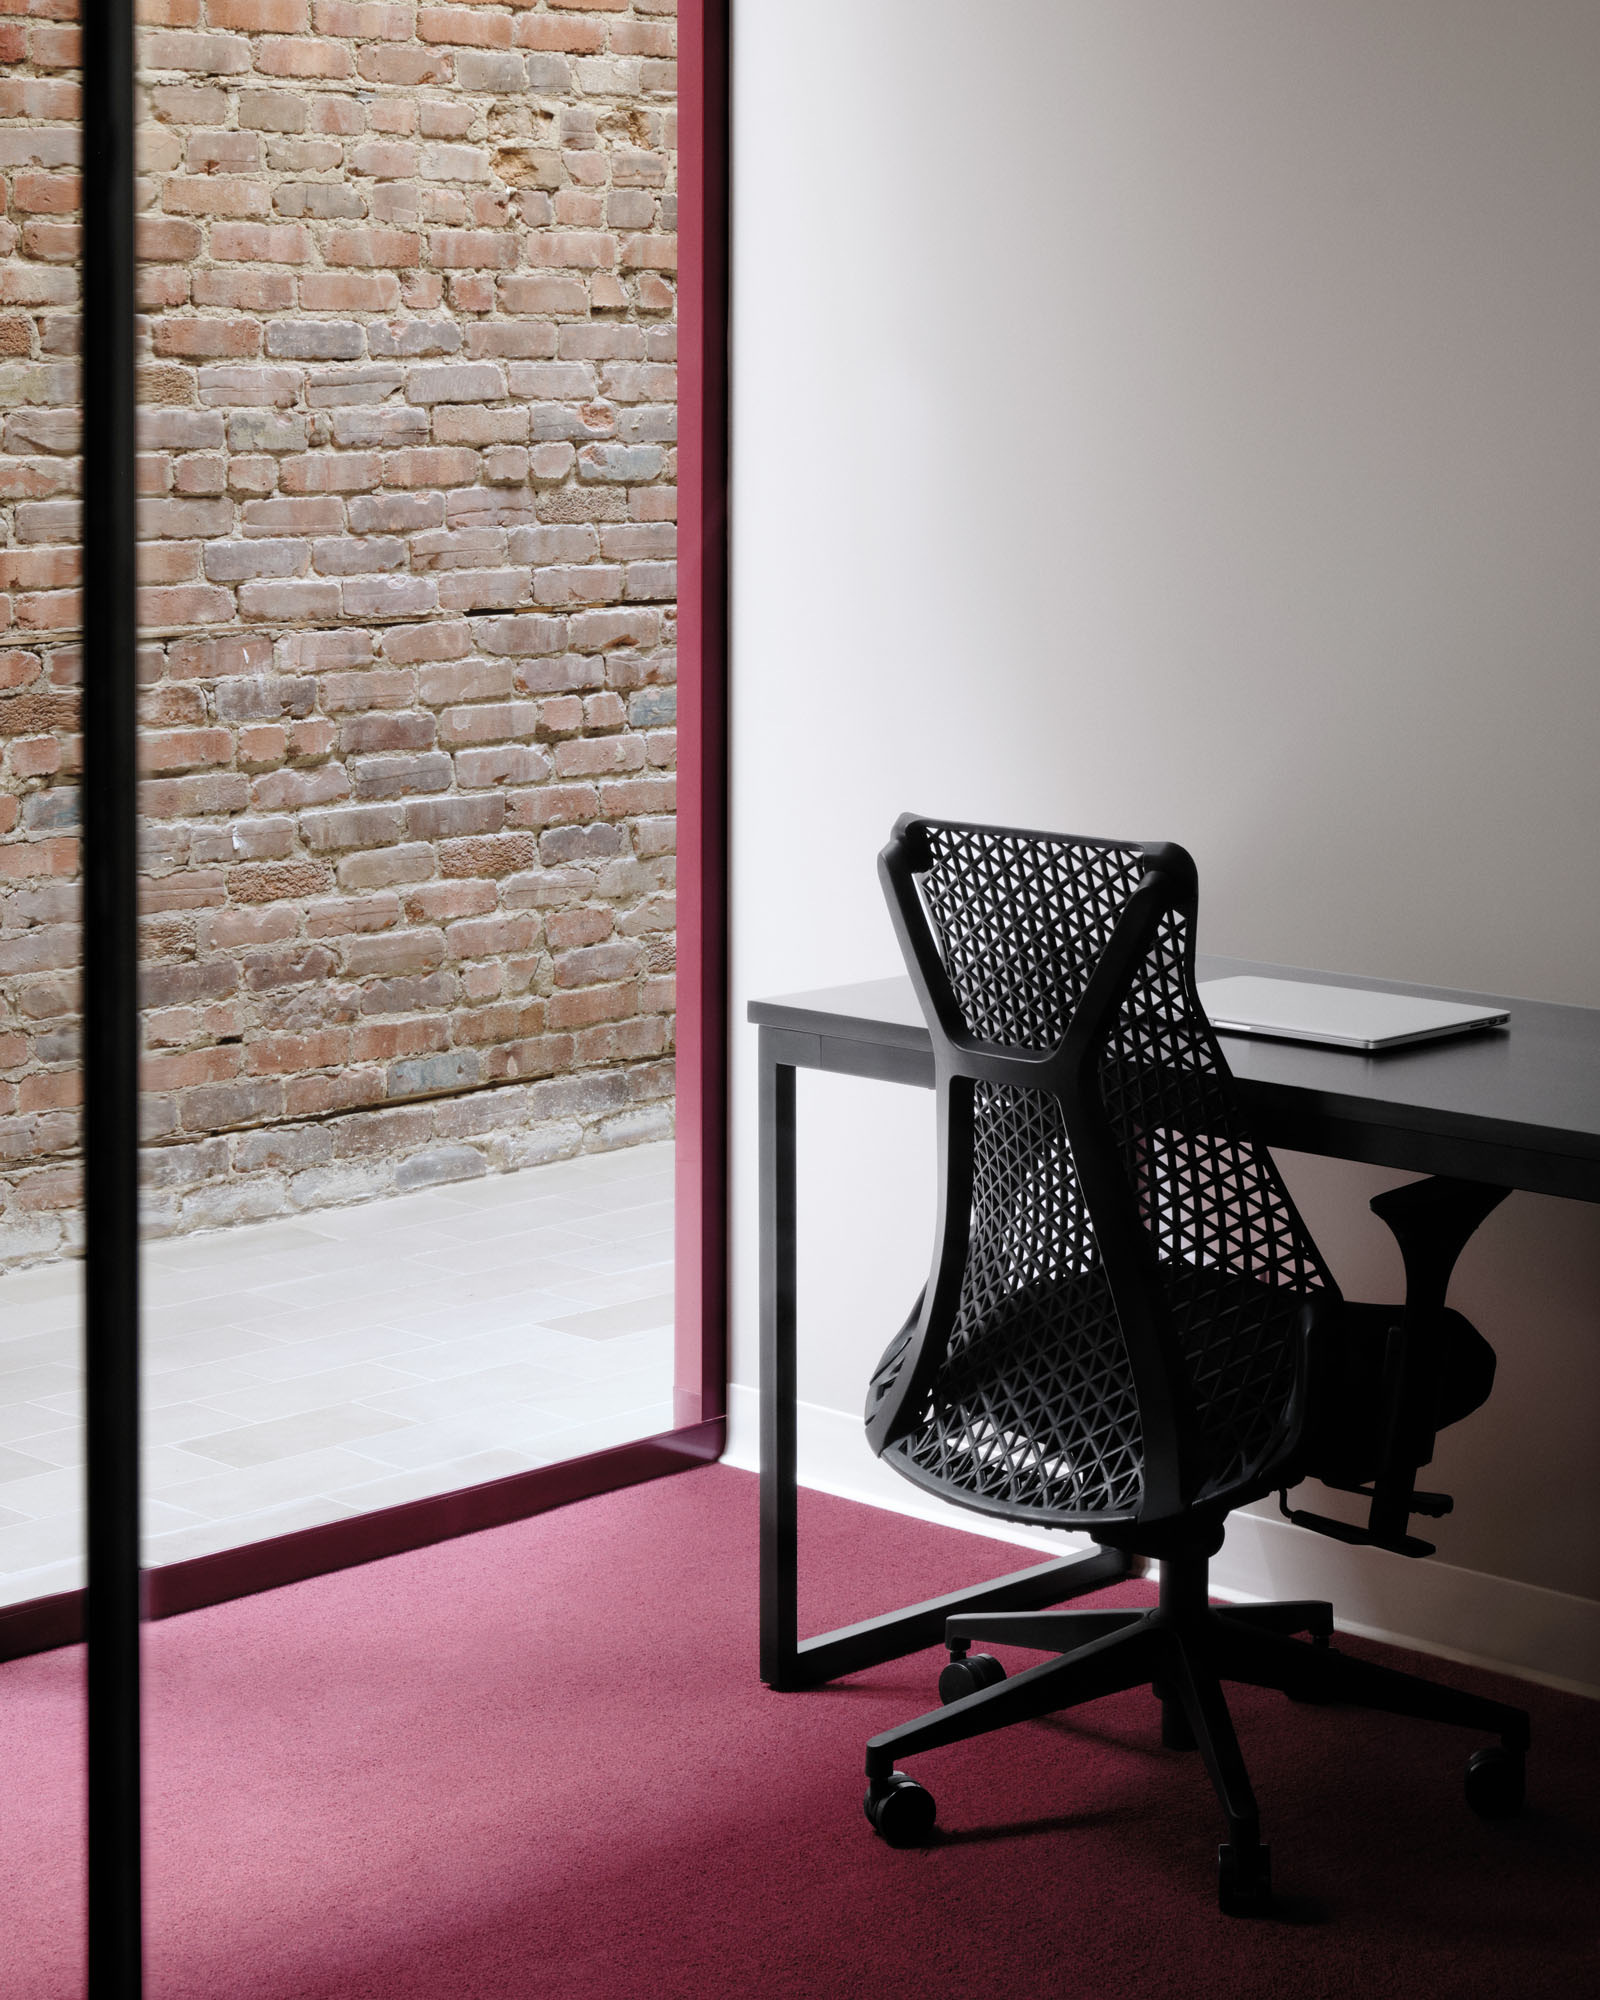 Work area interior